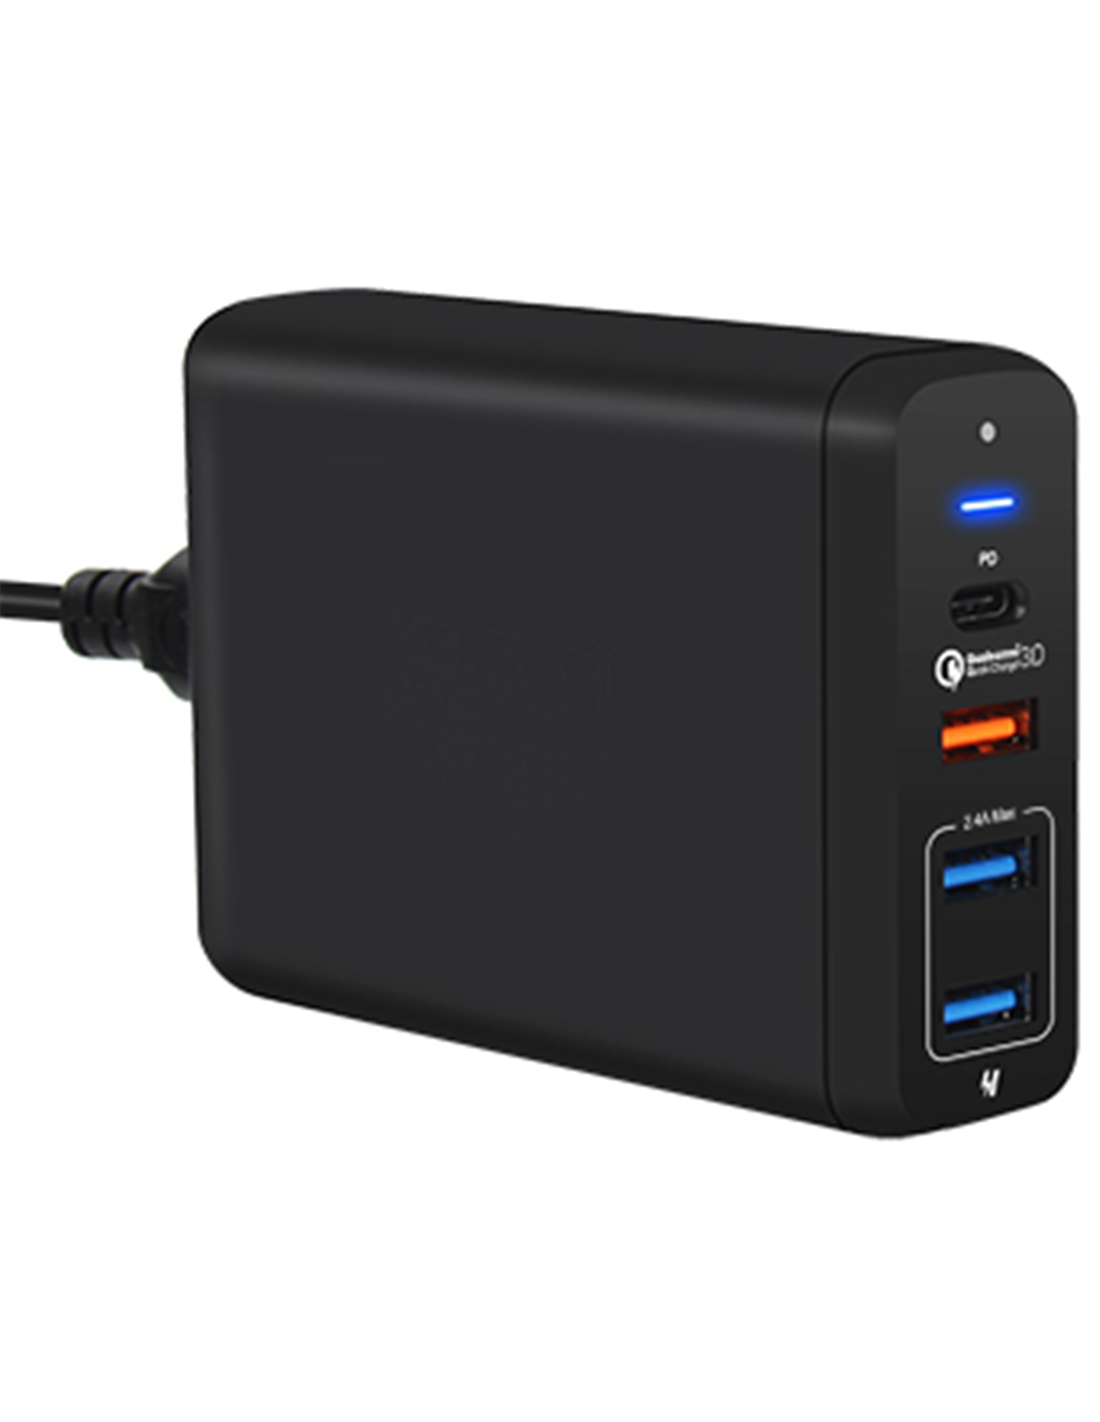 Multiladdare 4 port USBUSB C PD QC3.0 svart